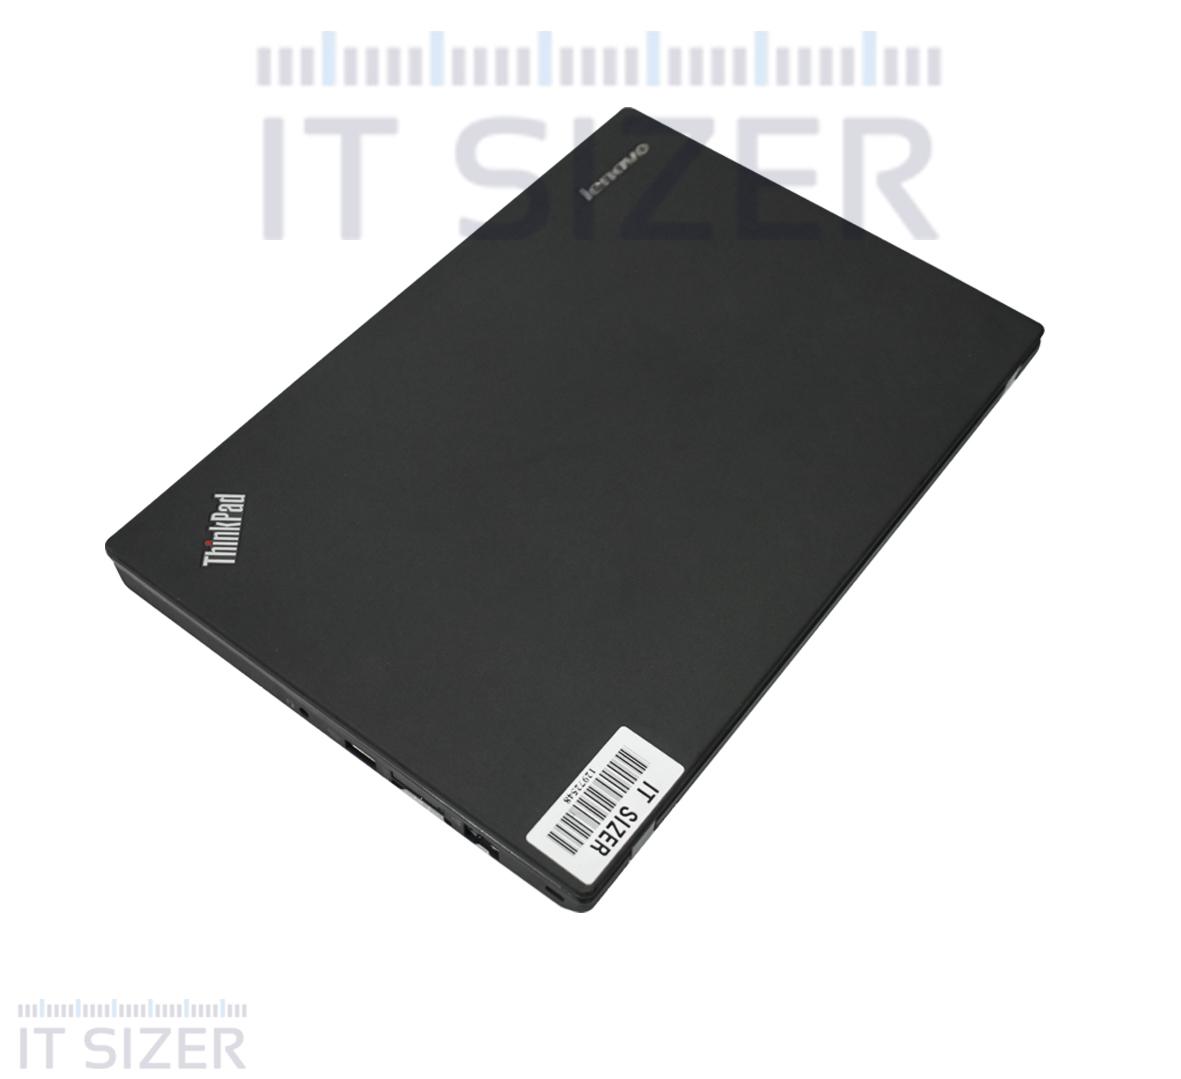 Lenovo X240 Business Laptop, Intel Core i7 4600U CPU, 8GB DDR3L SODIMM RAM, 256GB SSD 2.5, 12 inch Display, Windows 10 pro (Renewed)